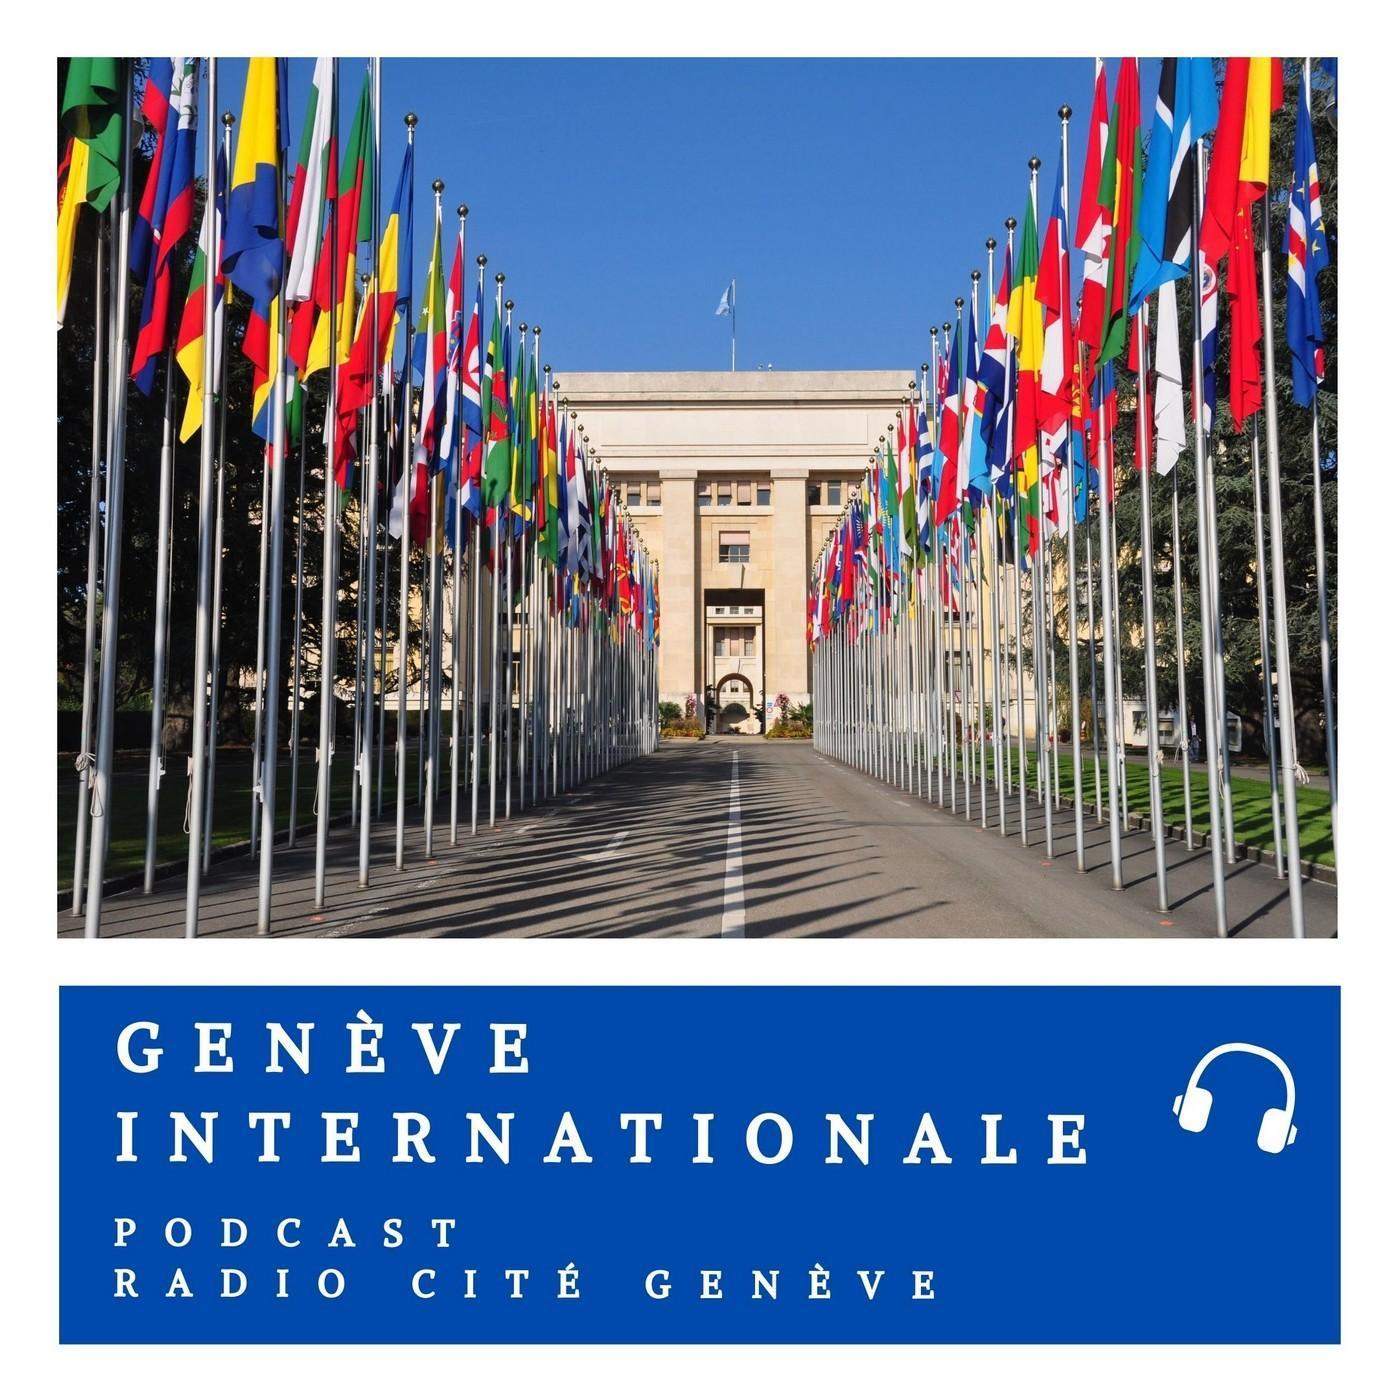 Genève Internationale 02/09/2021 - Florence Dozol & Pierre-Yves Bernard